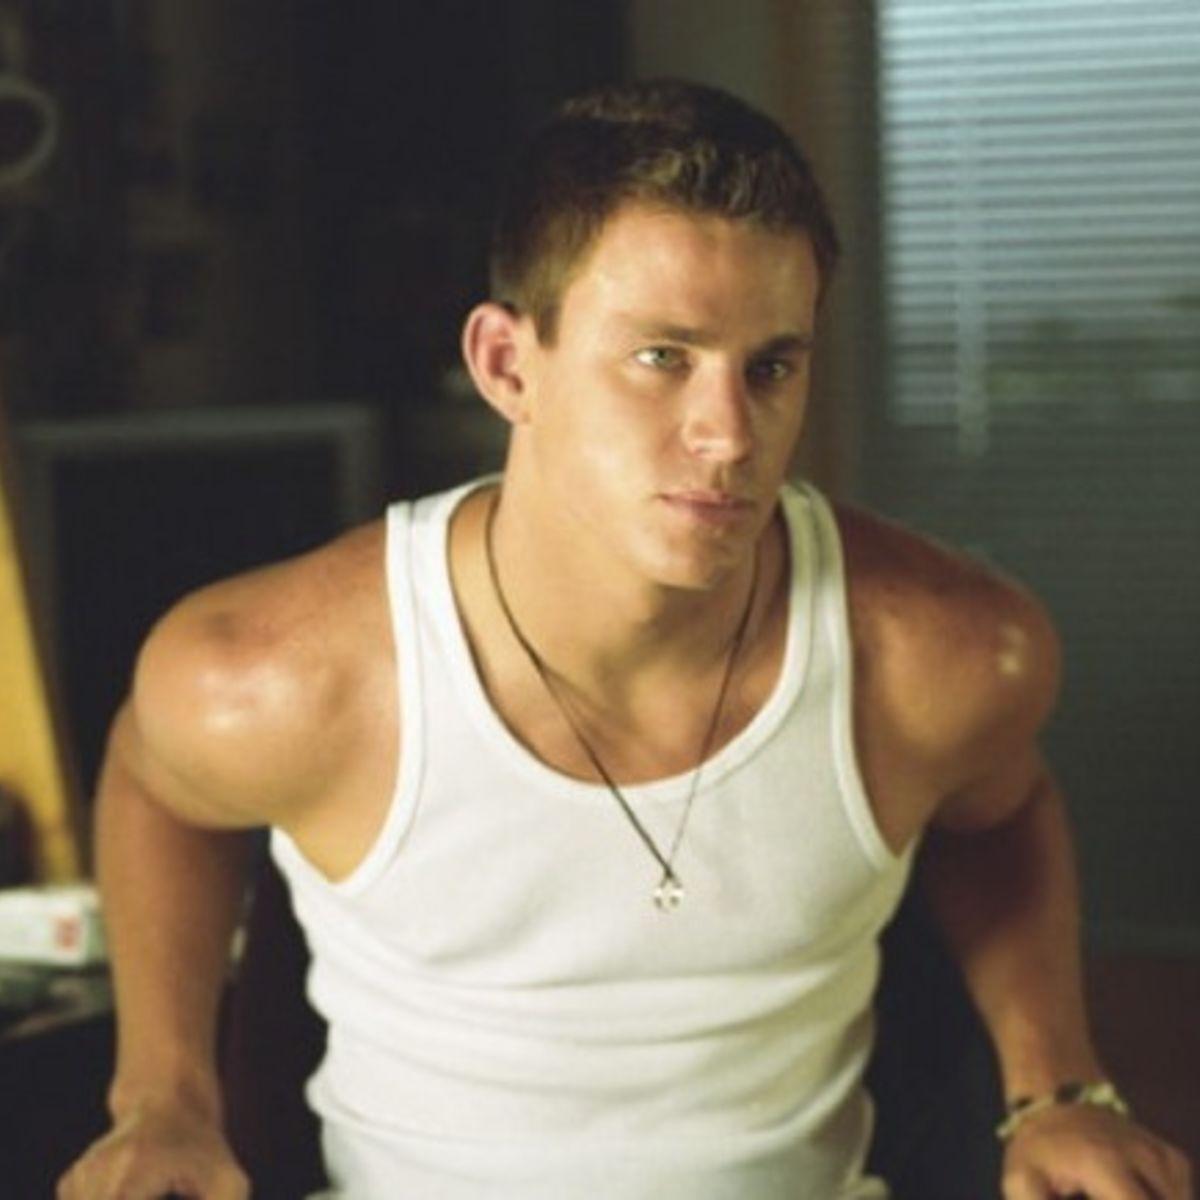 Channing_Tatum.jpg